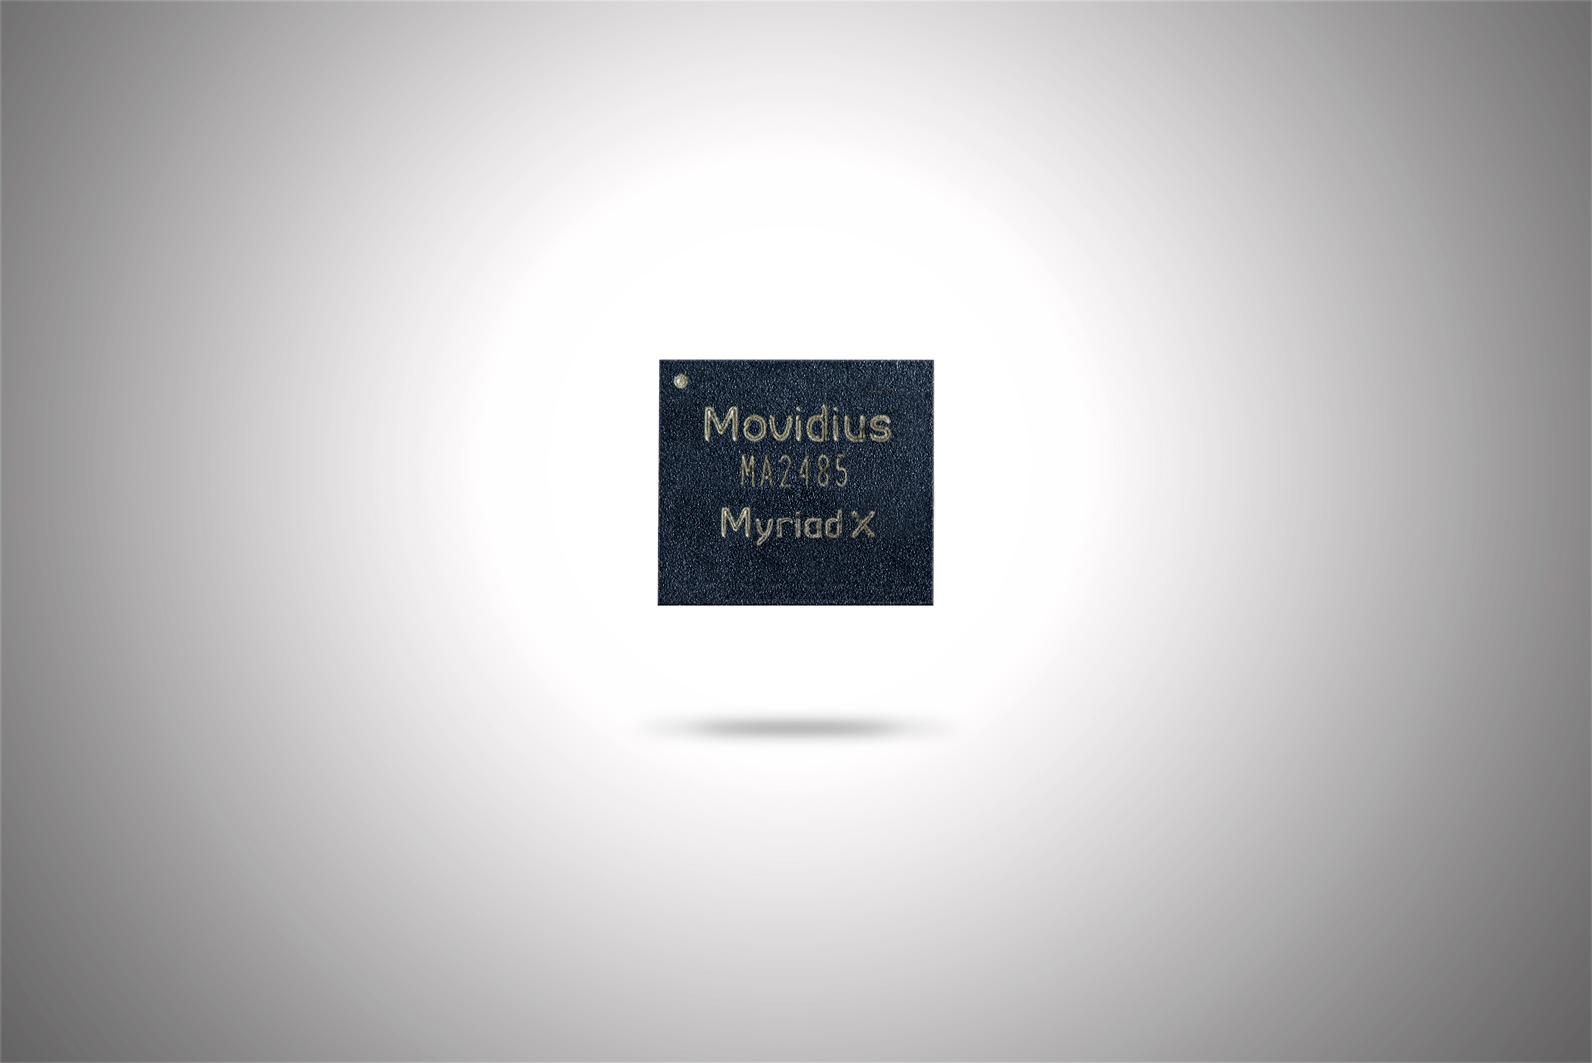 I-21366_Movidius_MyraidX_Chip-NEW.jpg